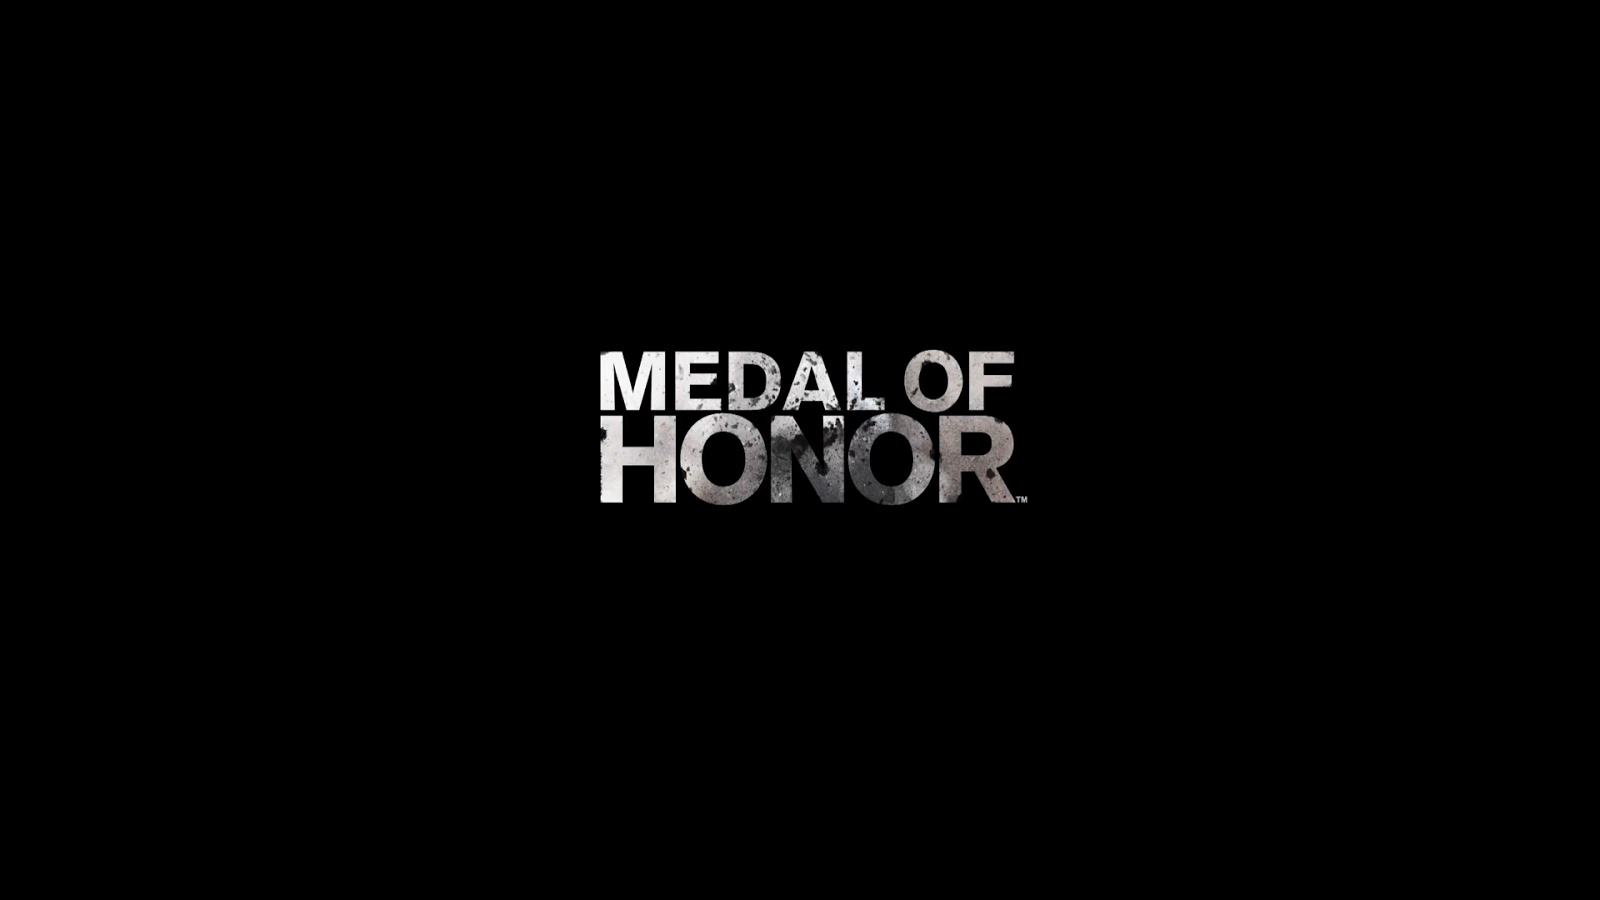 Medal Of Honor Wallpaper Free Download